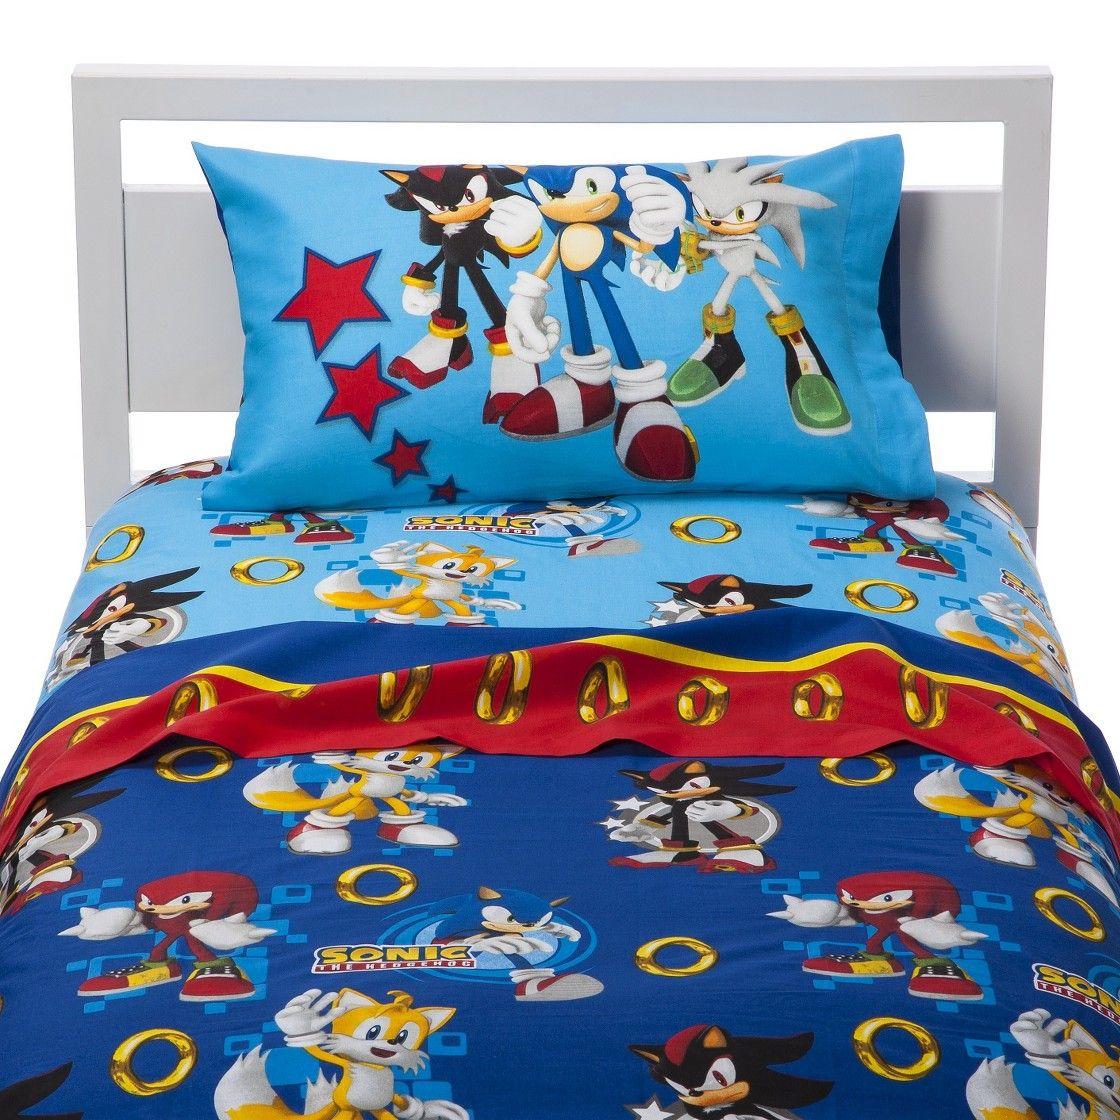 Sonic The Hedgehog Sheet Set